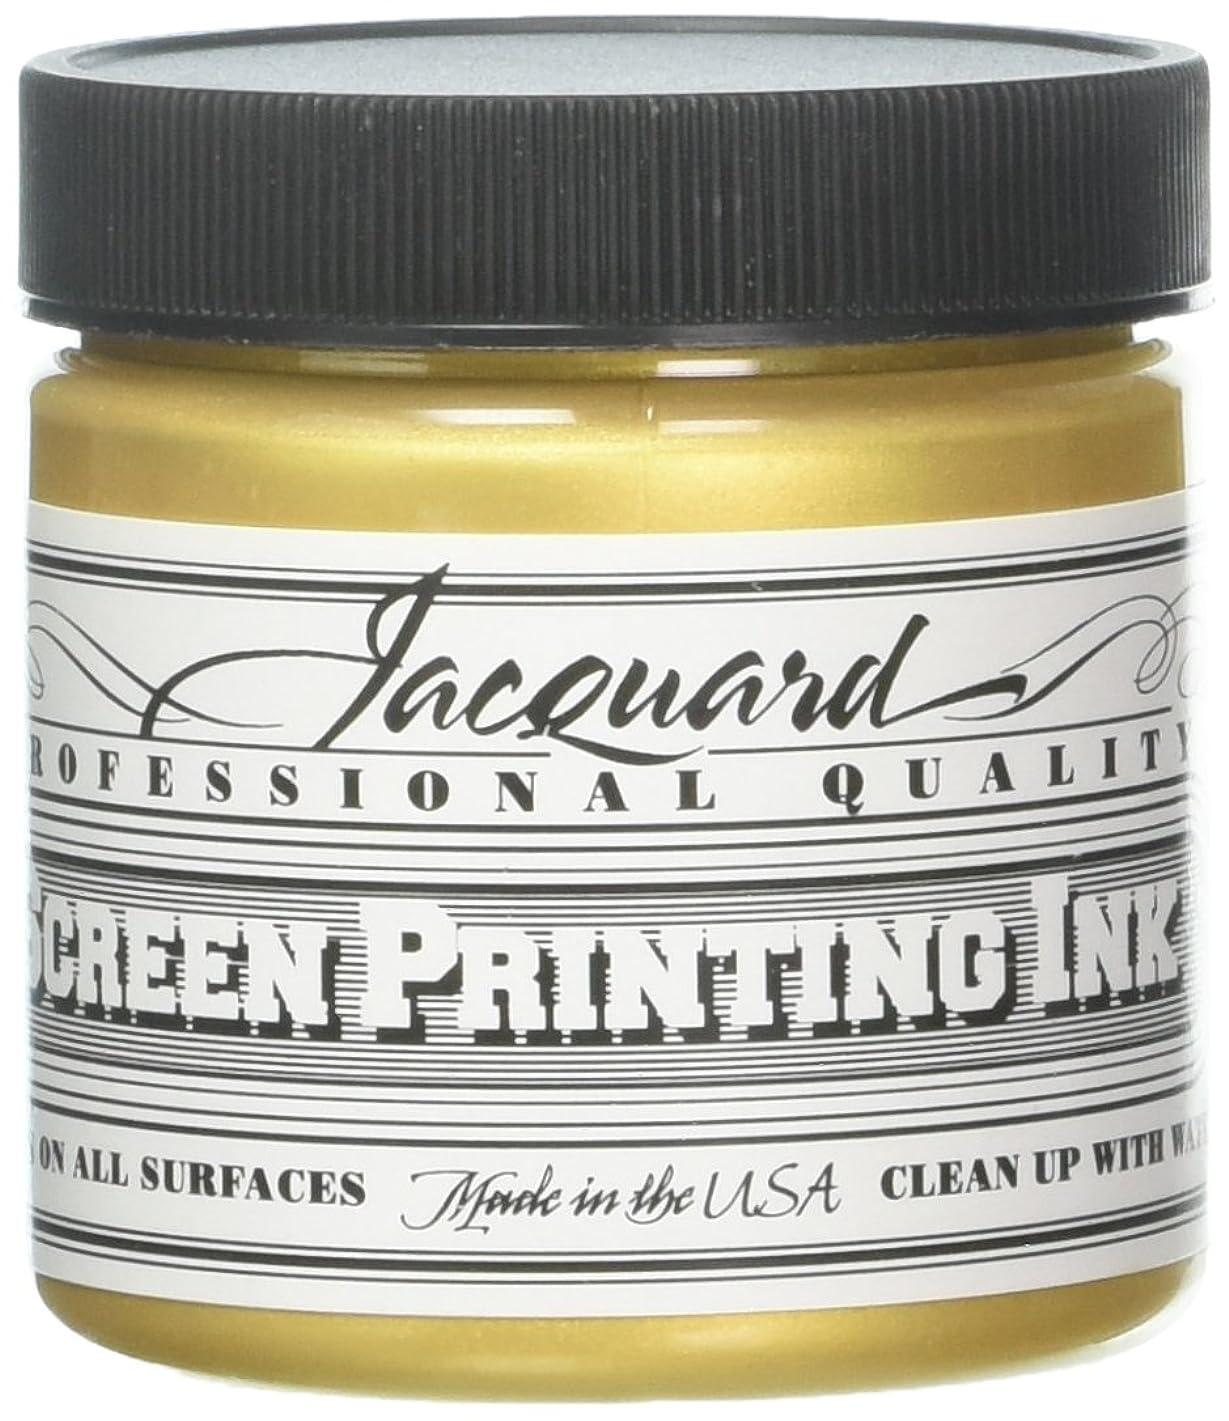 Jacquard JAC-JSI1120 Screen Printing Ink, 4 oz, Gold